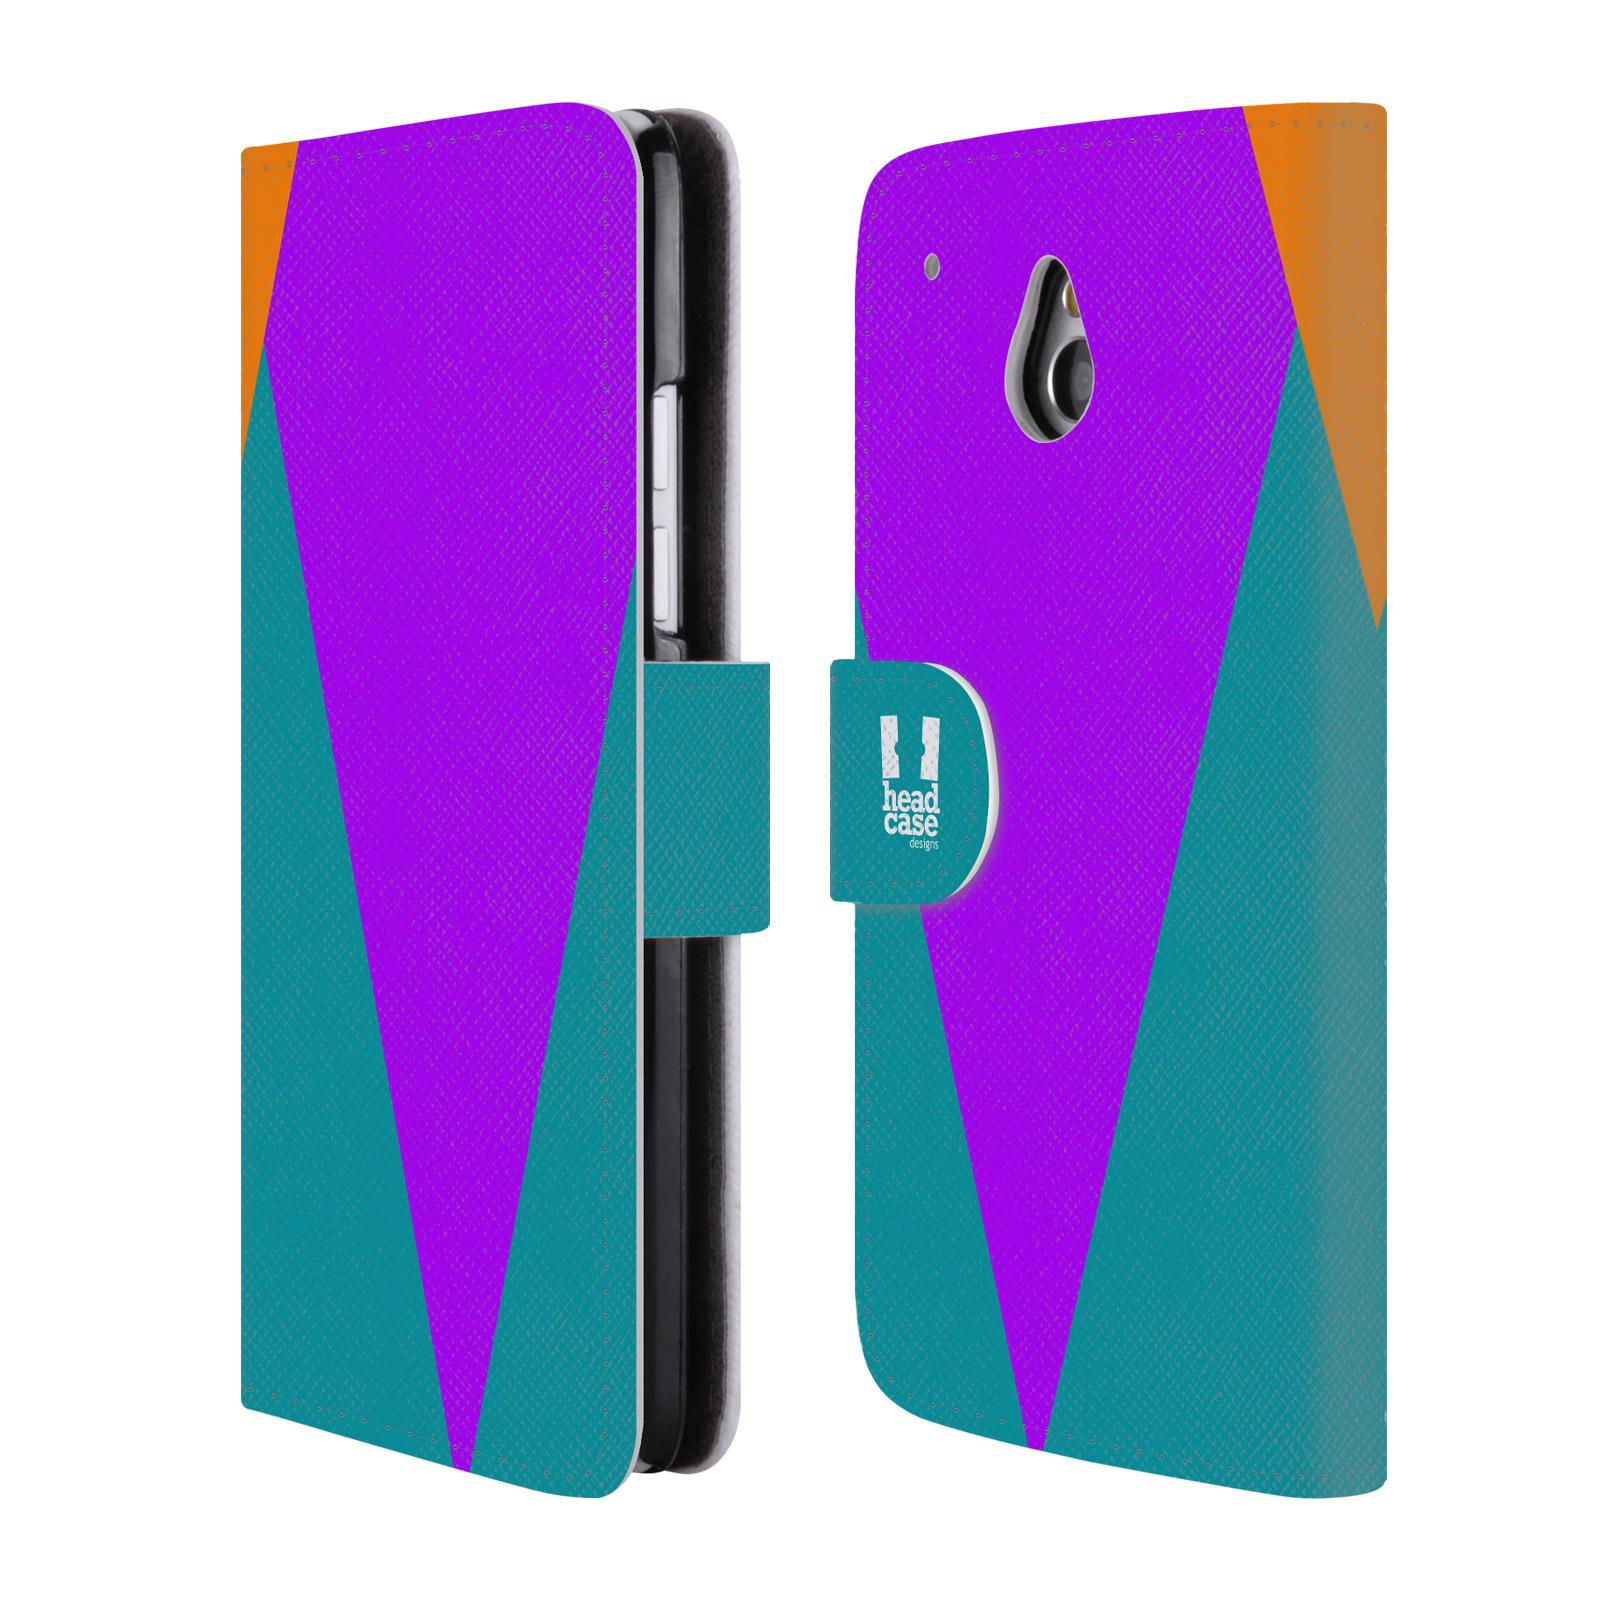 HEAD CASE Flipové pouzdro pro mobil HTC ONE MINI barevné tvary šipka fialová